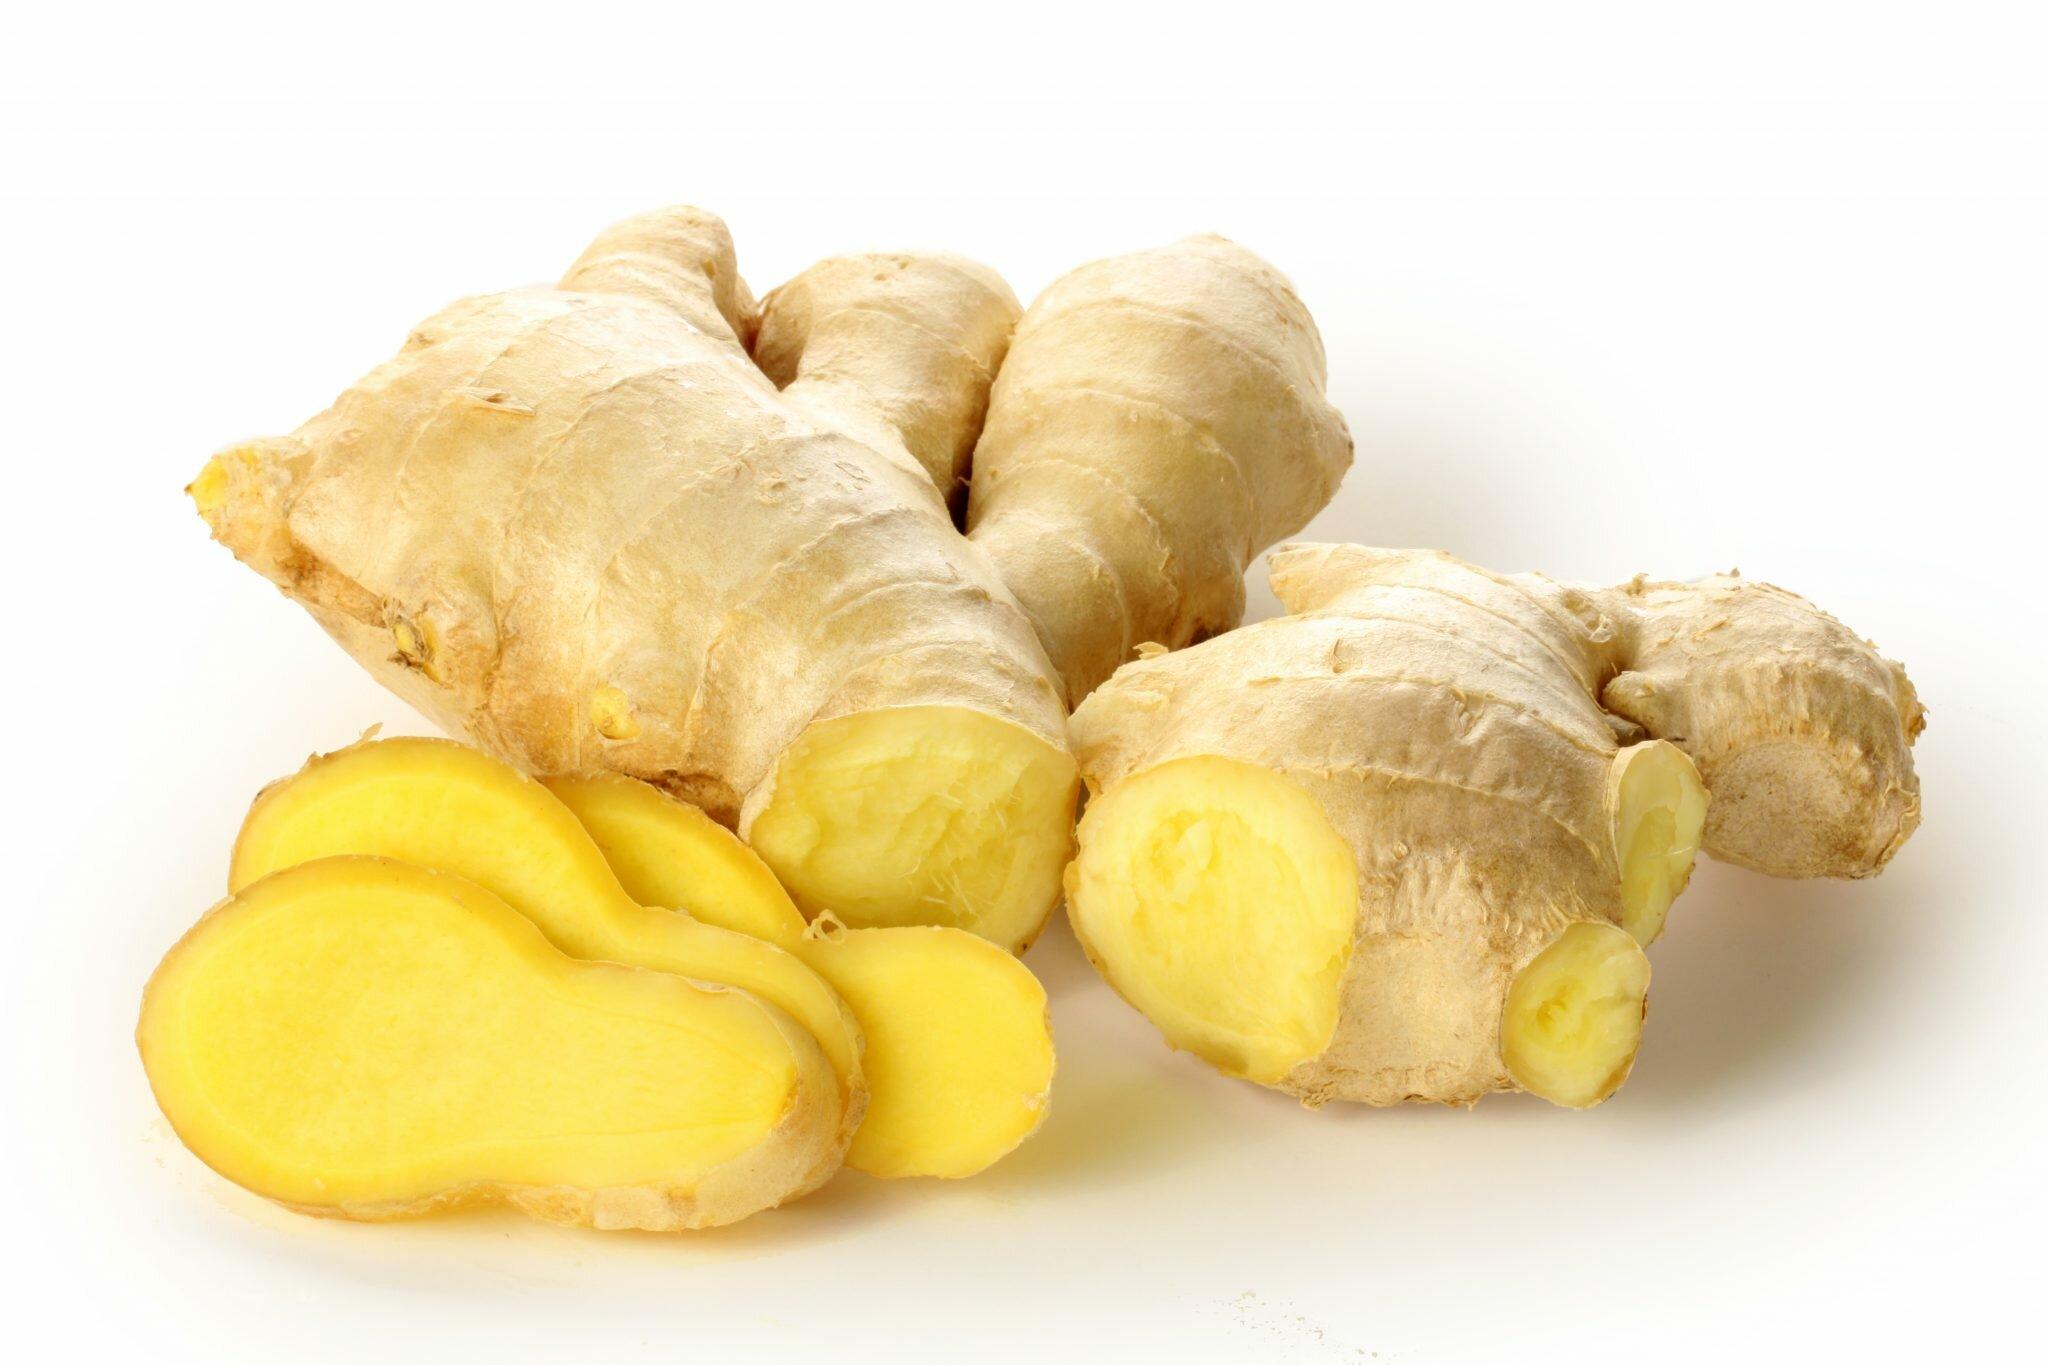 Ginger for solving Digestive Problems